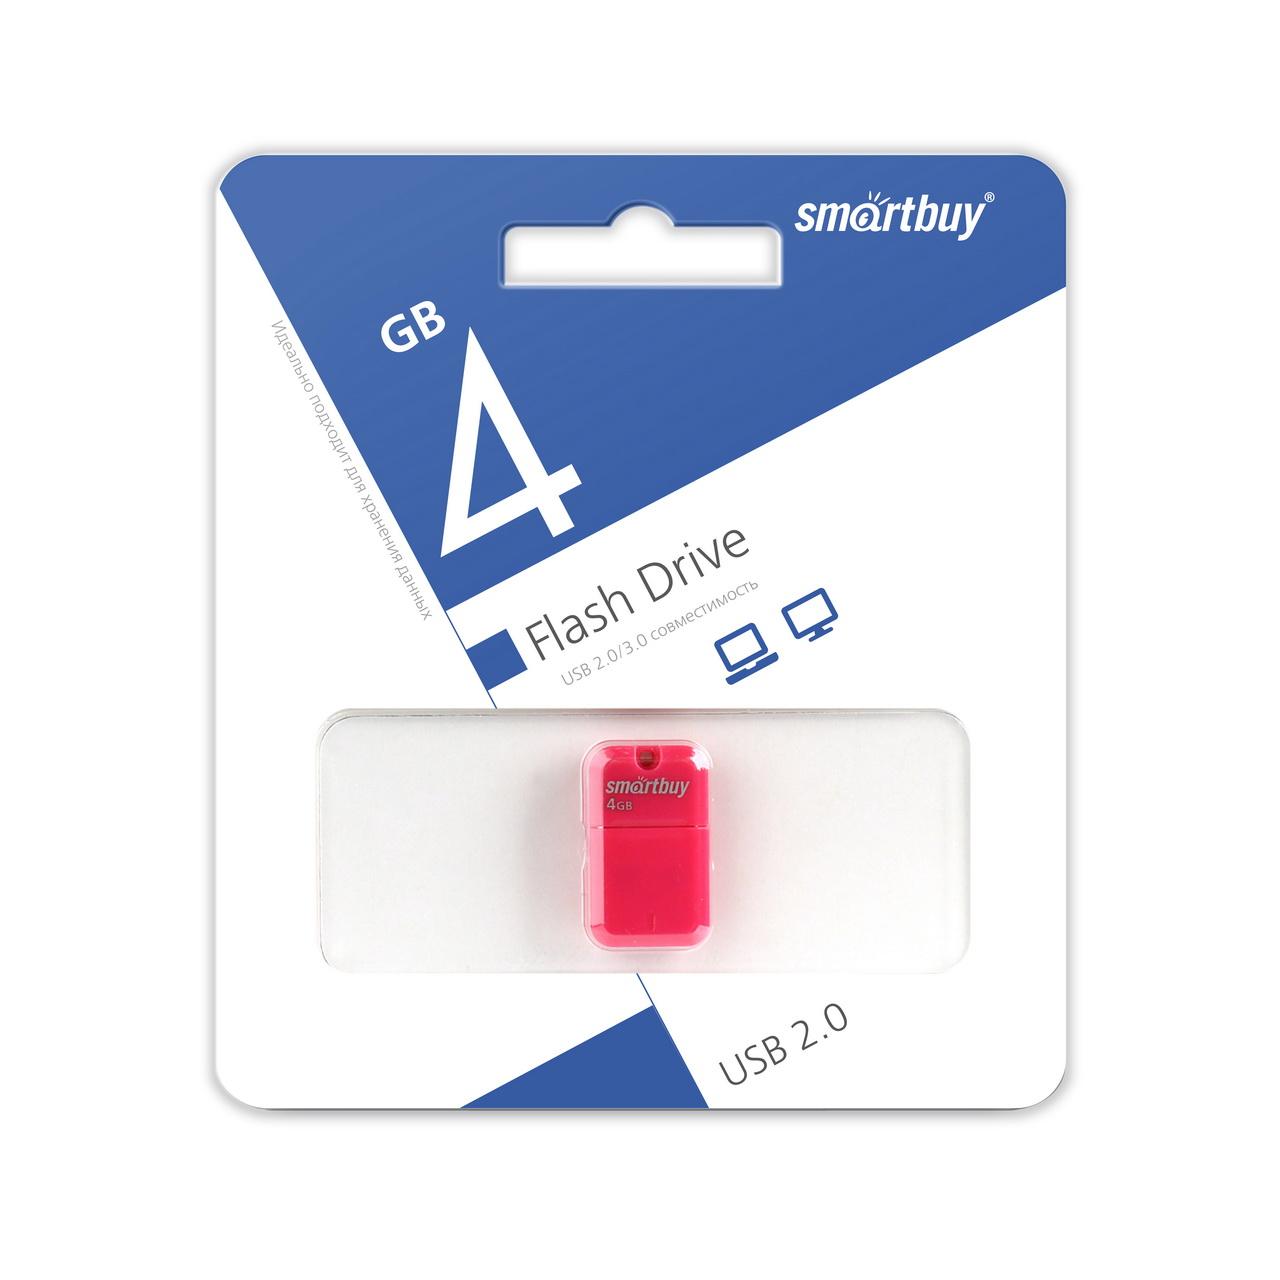 USB 2.0 флэш-диск Smartbuy ART Pink 4GB оптом